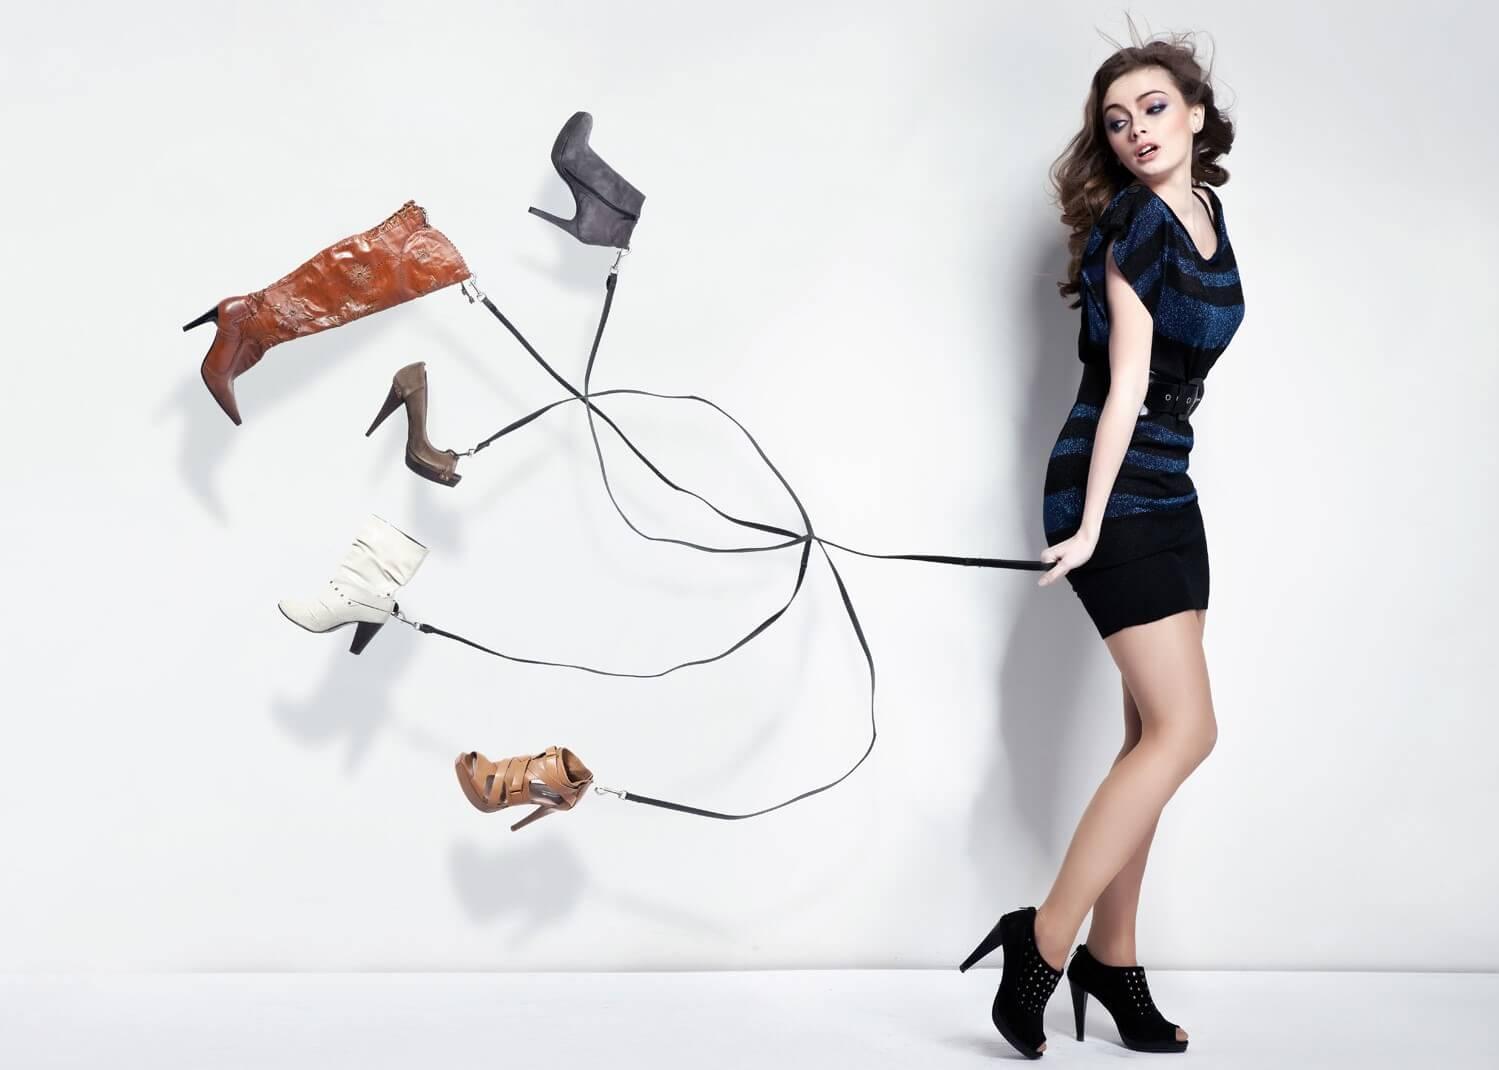 каких реклама картинок обуви поникающий, лук-слизун так